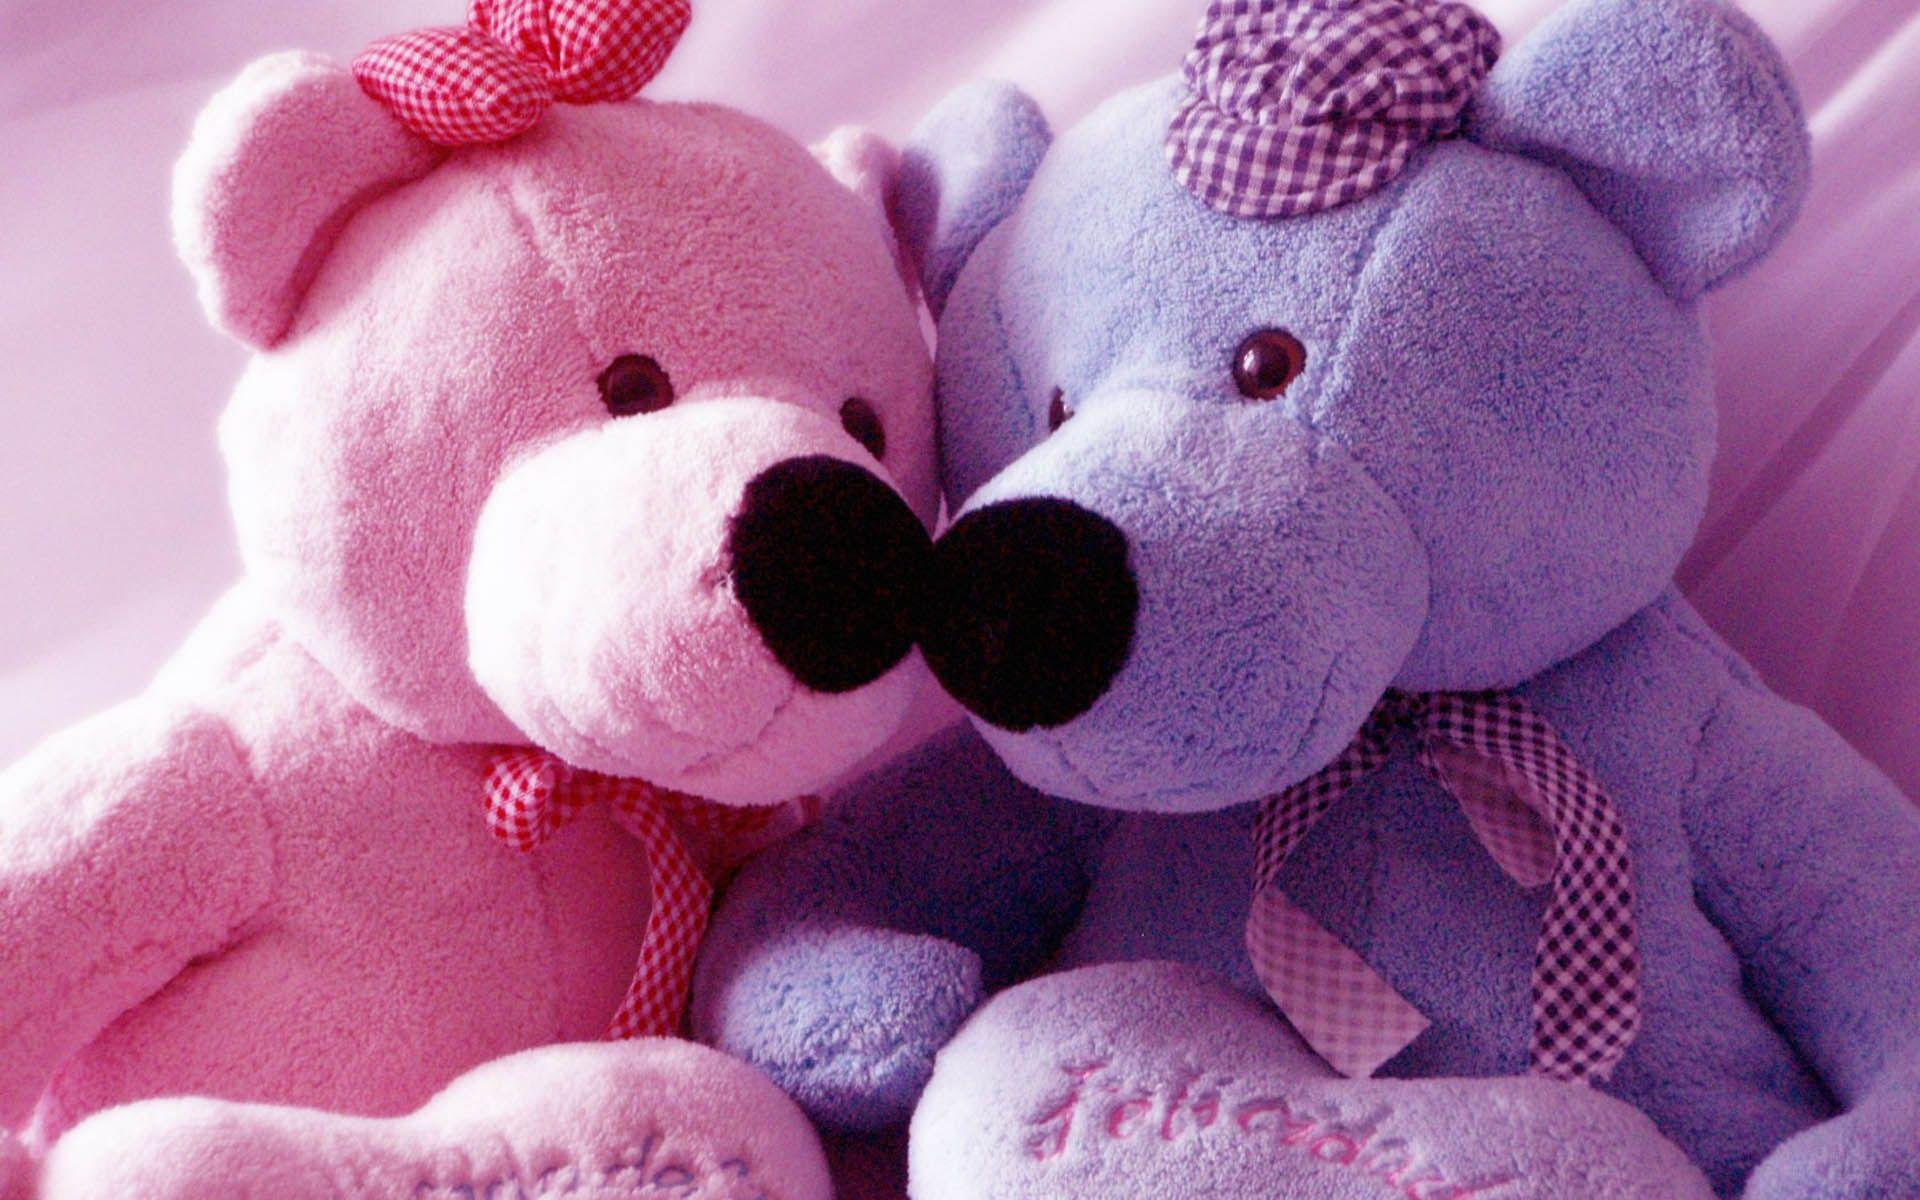 Cute Pink Teddy Bear Wallpapers For Desktop Wallpaper Cave